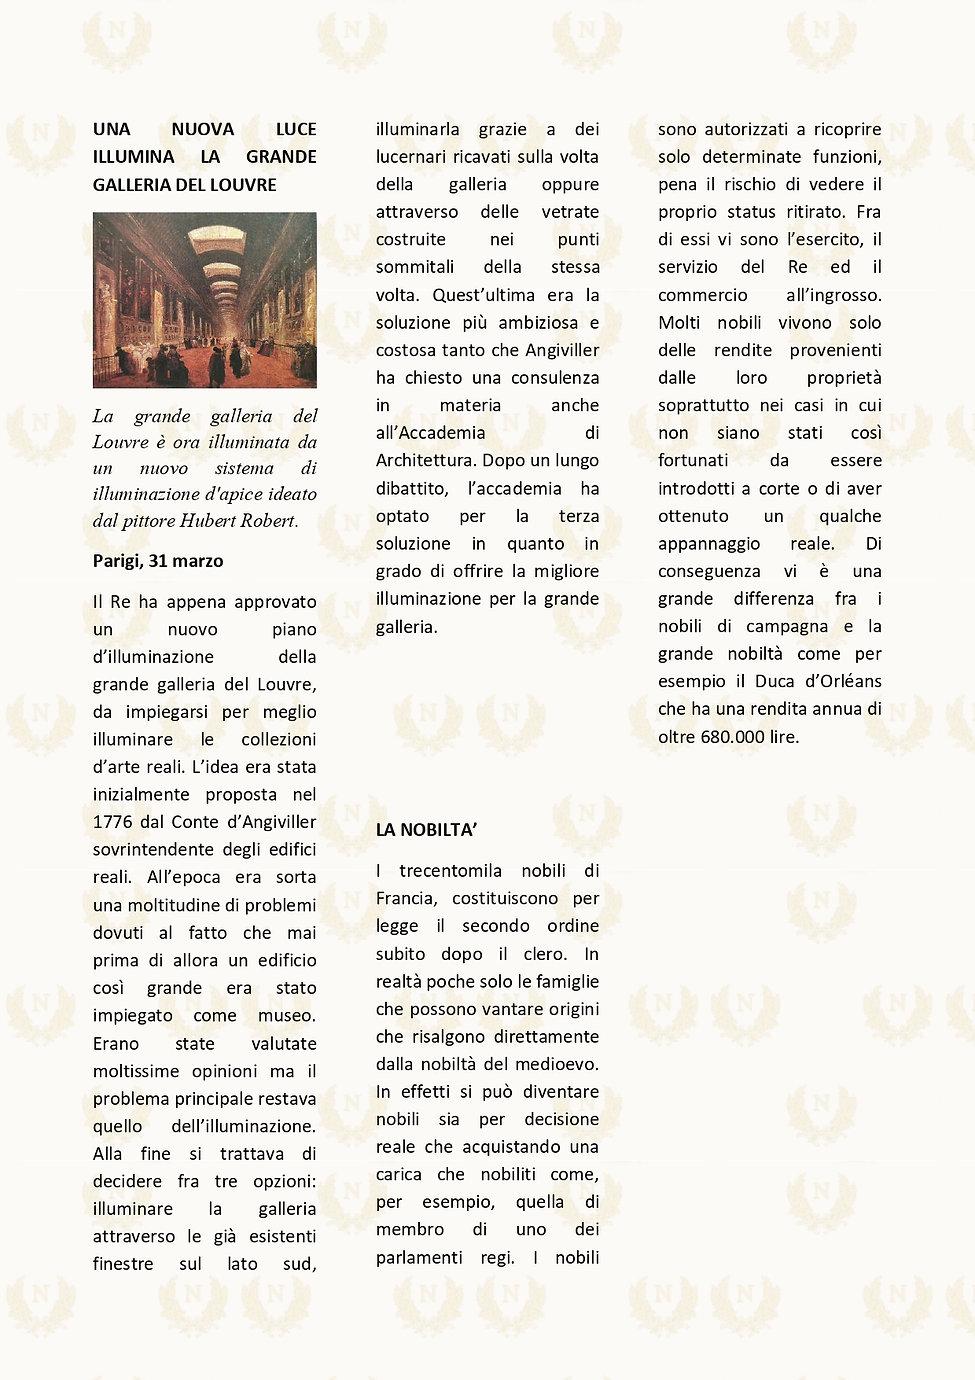 Cronache Rivoluzionarie - marzo 1788 - n. 37_page-0006.jpg